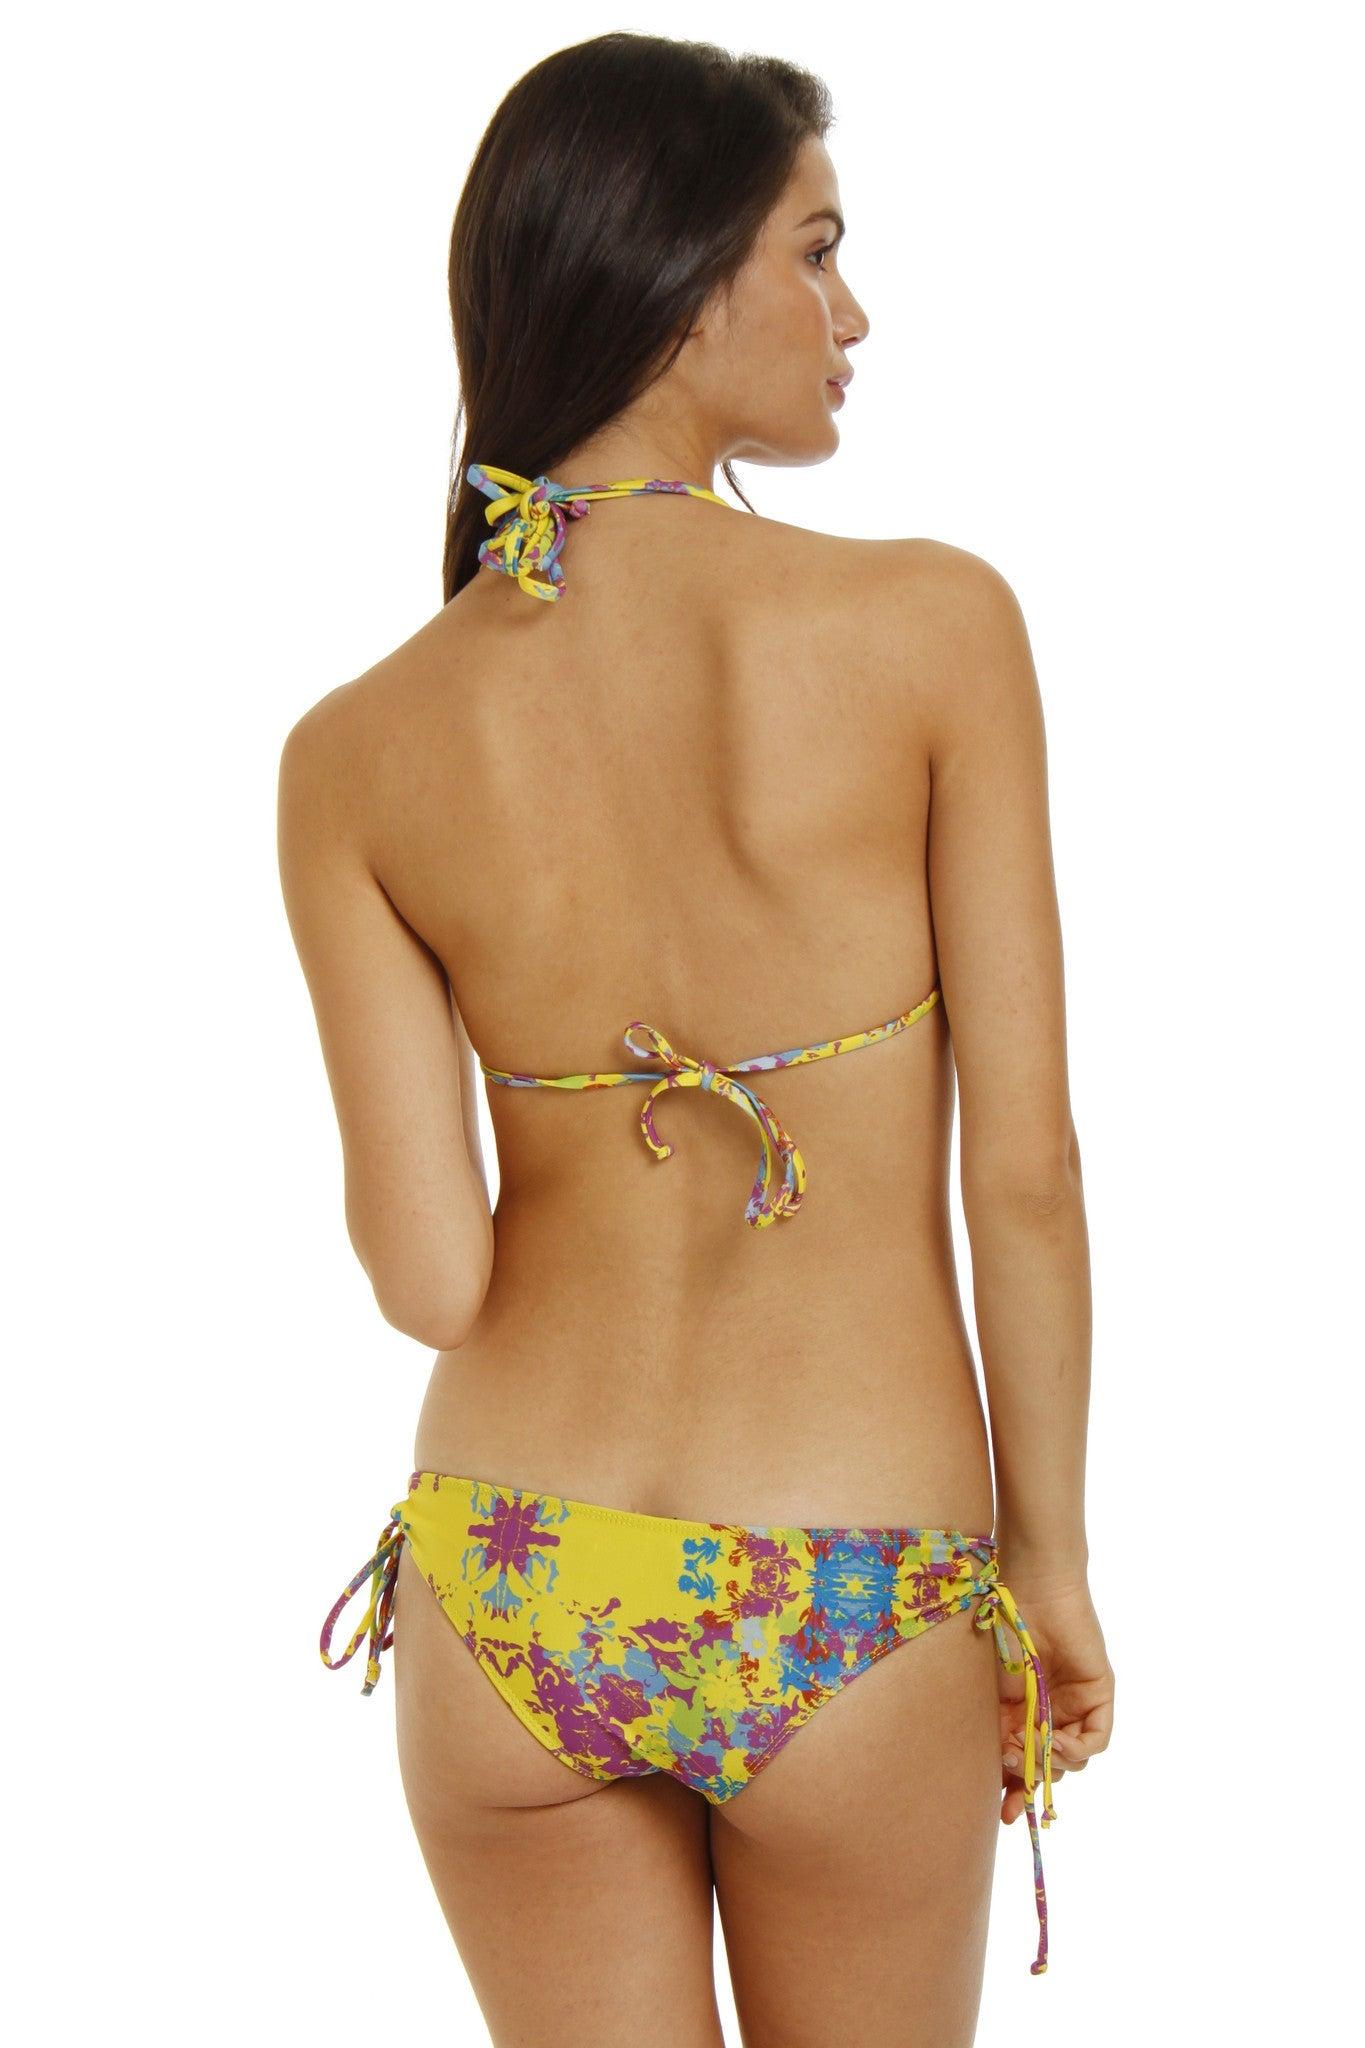 BEACH RIOT Daffodil Adjustable Triangle Bikini Top - Spring Fling Bikini Top | Spring Fling| Daffodil Adjustable Triangle Bikini Top - Spring Fling